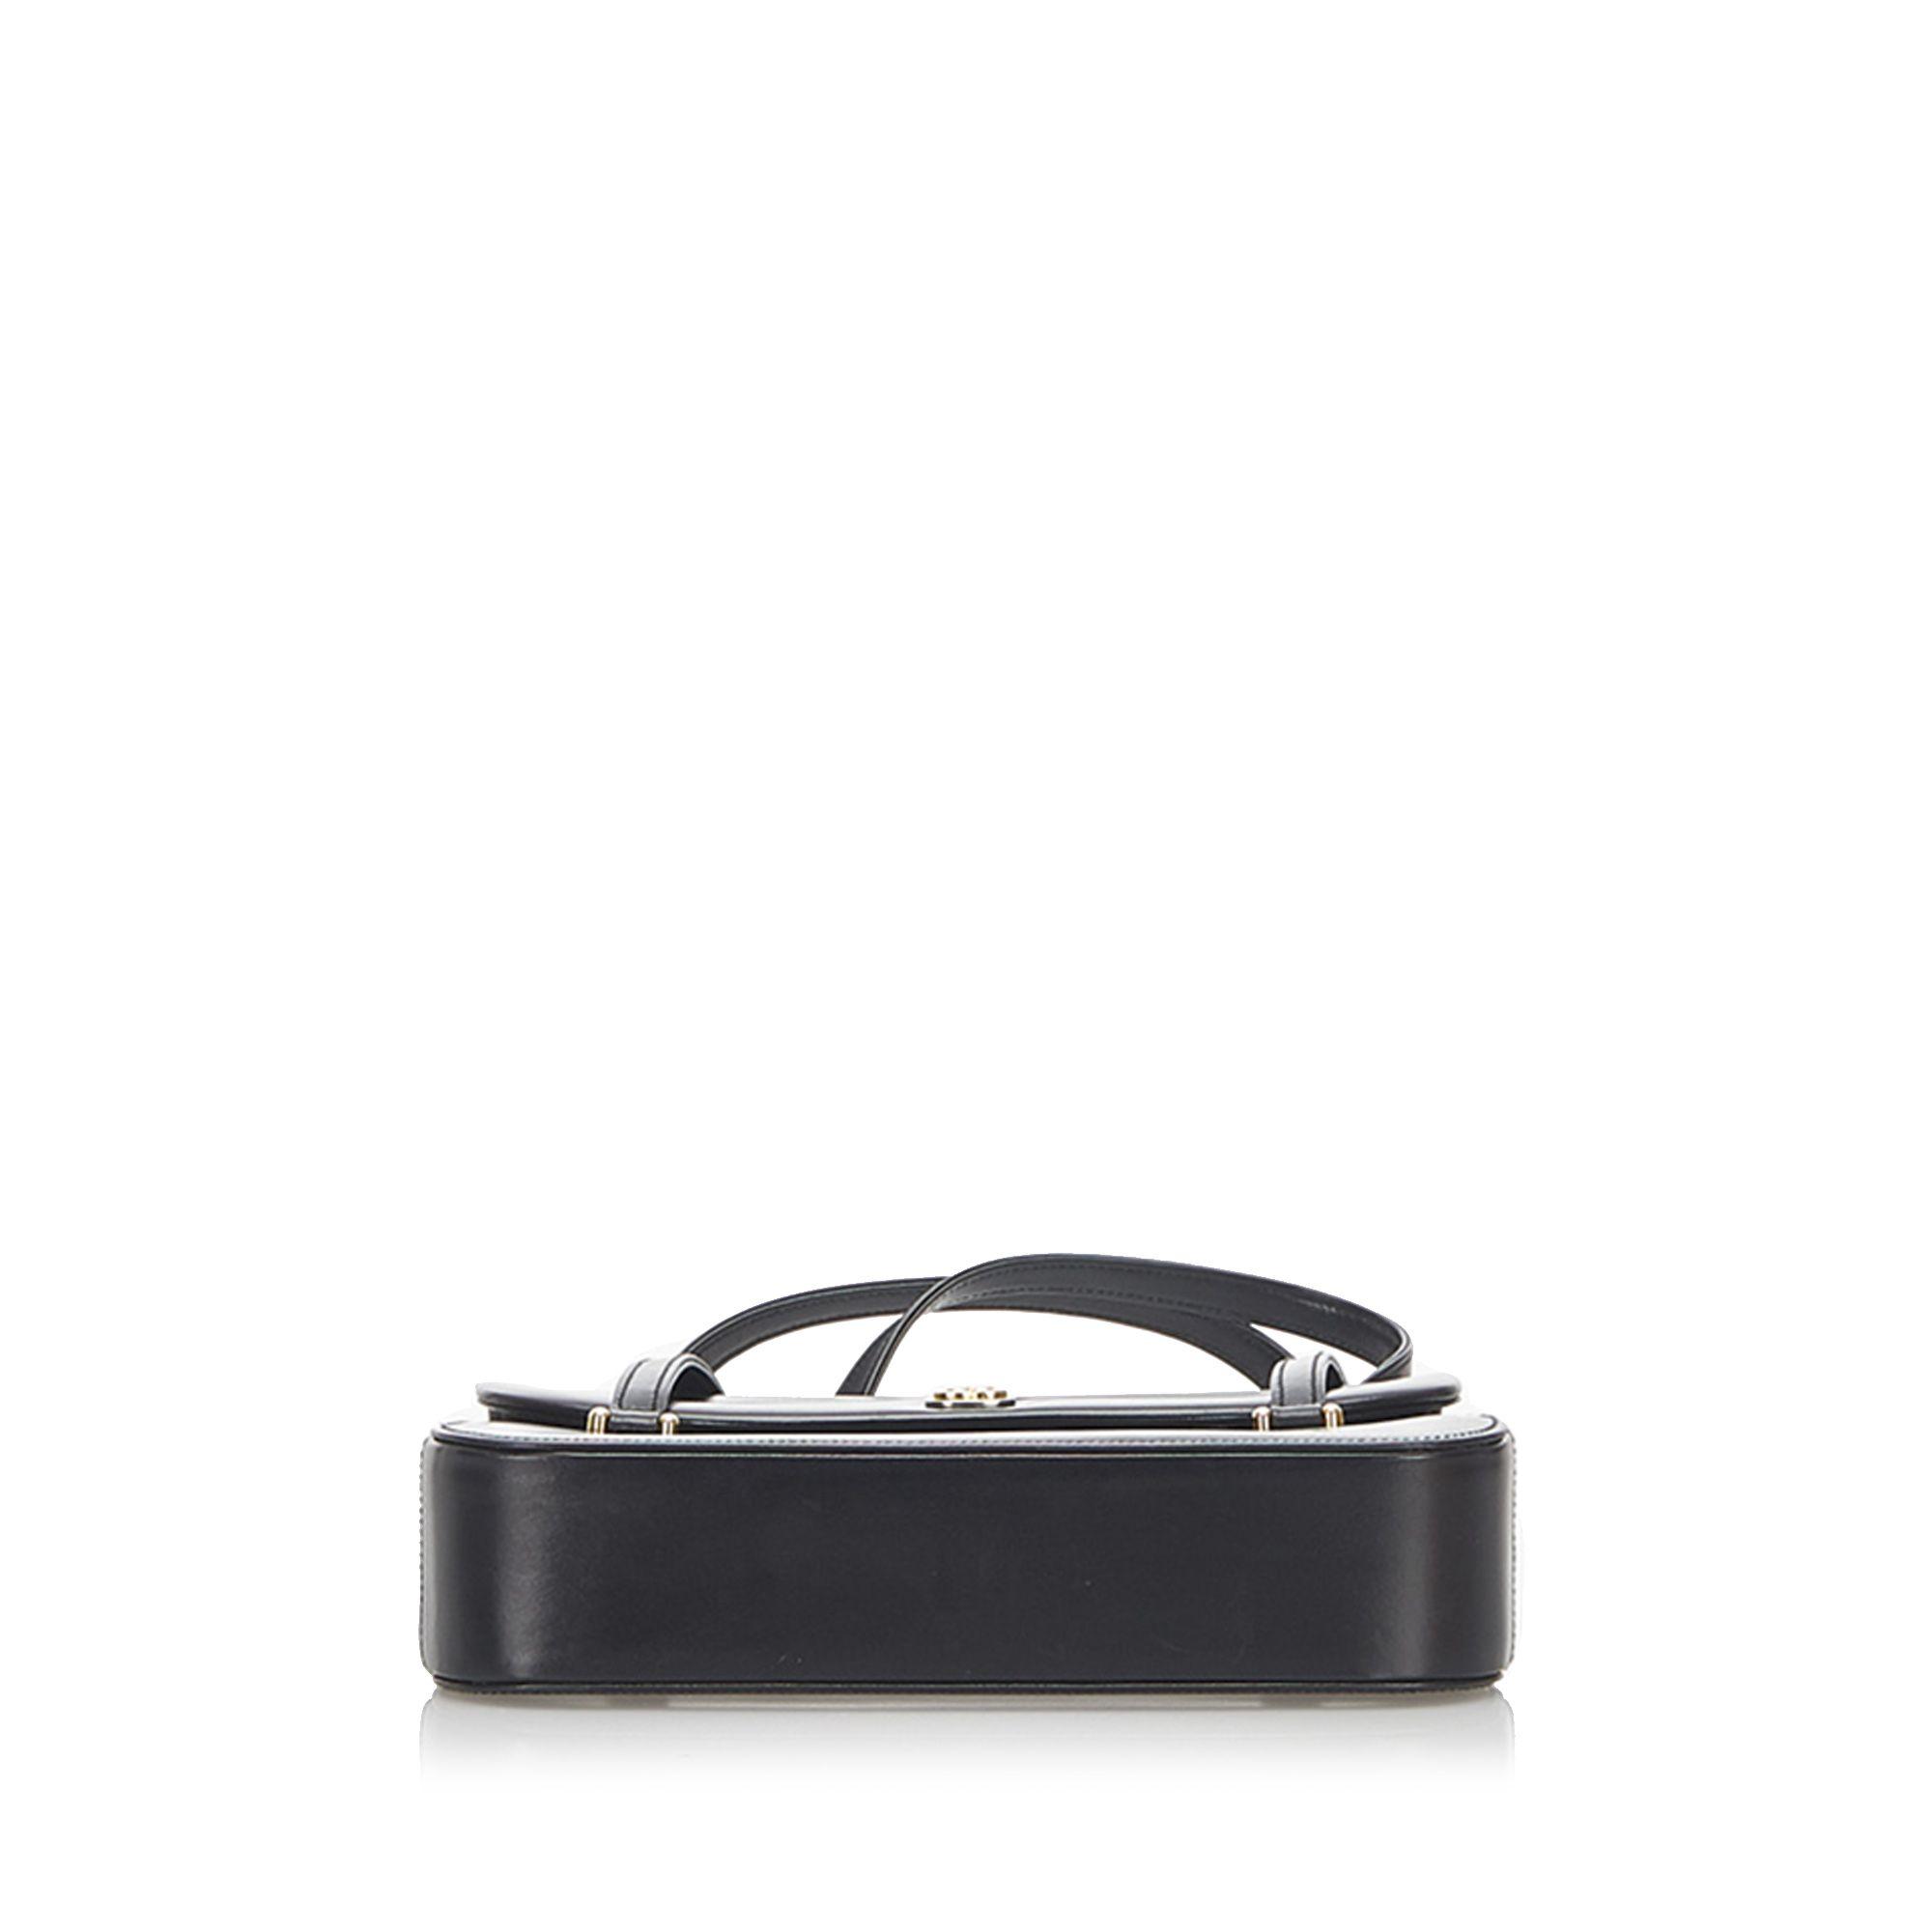 Vintage Gucci Leather Handbag Black